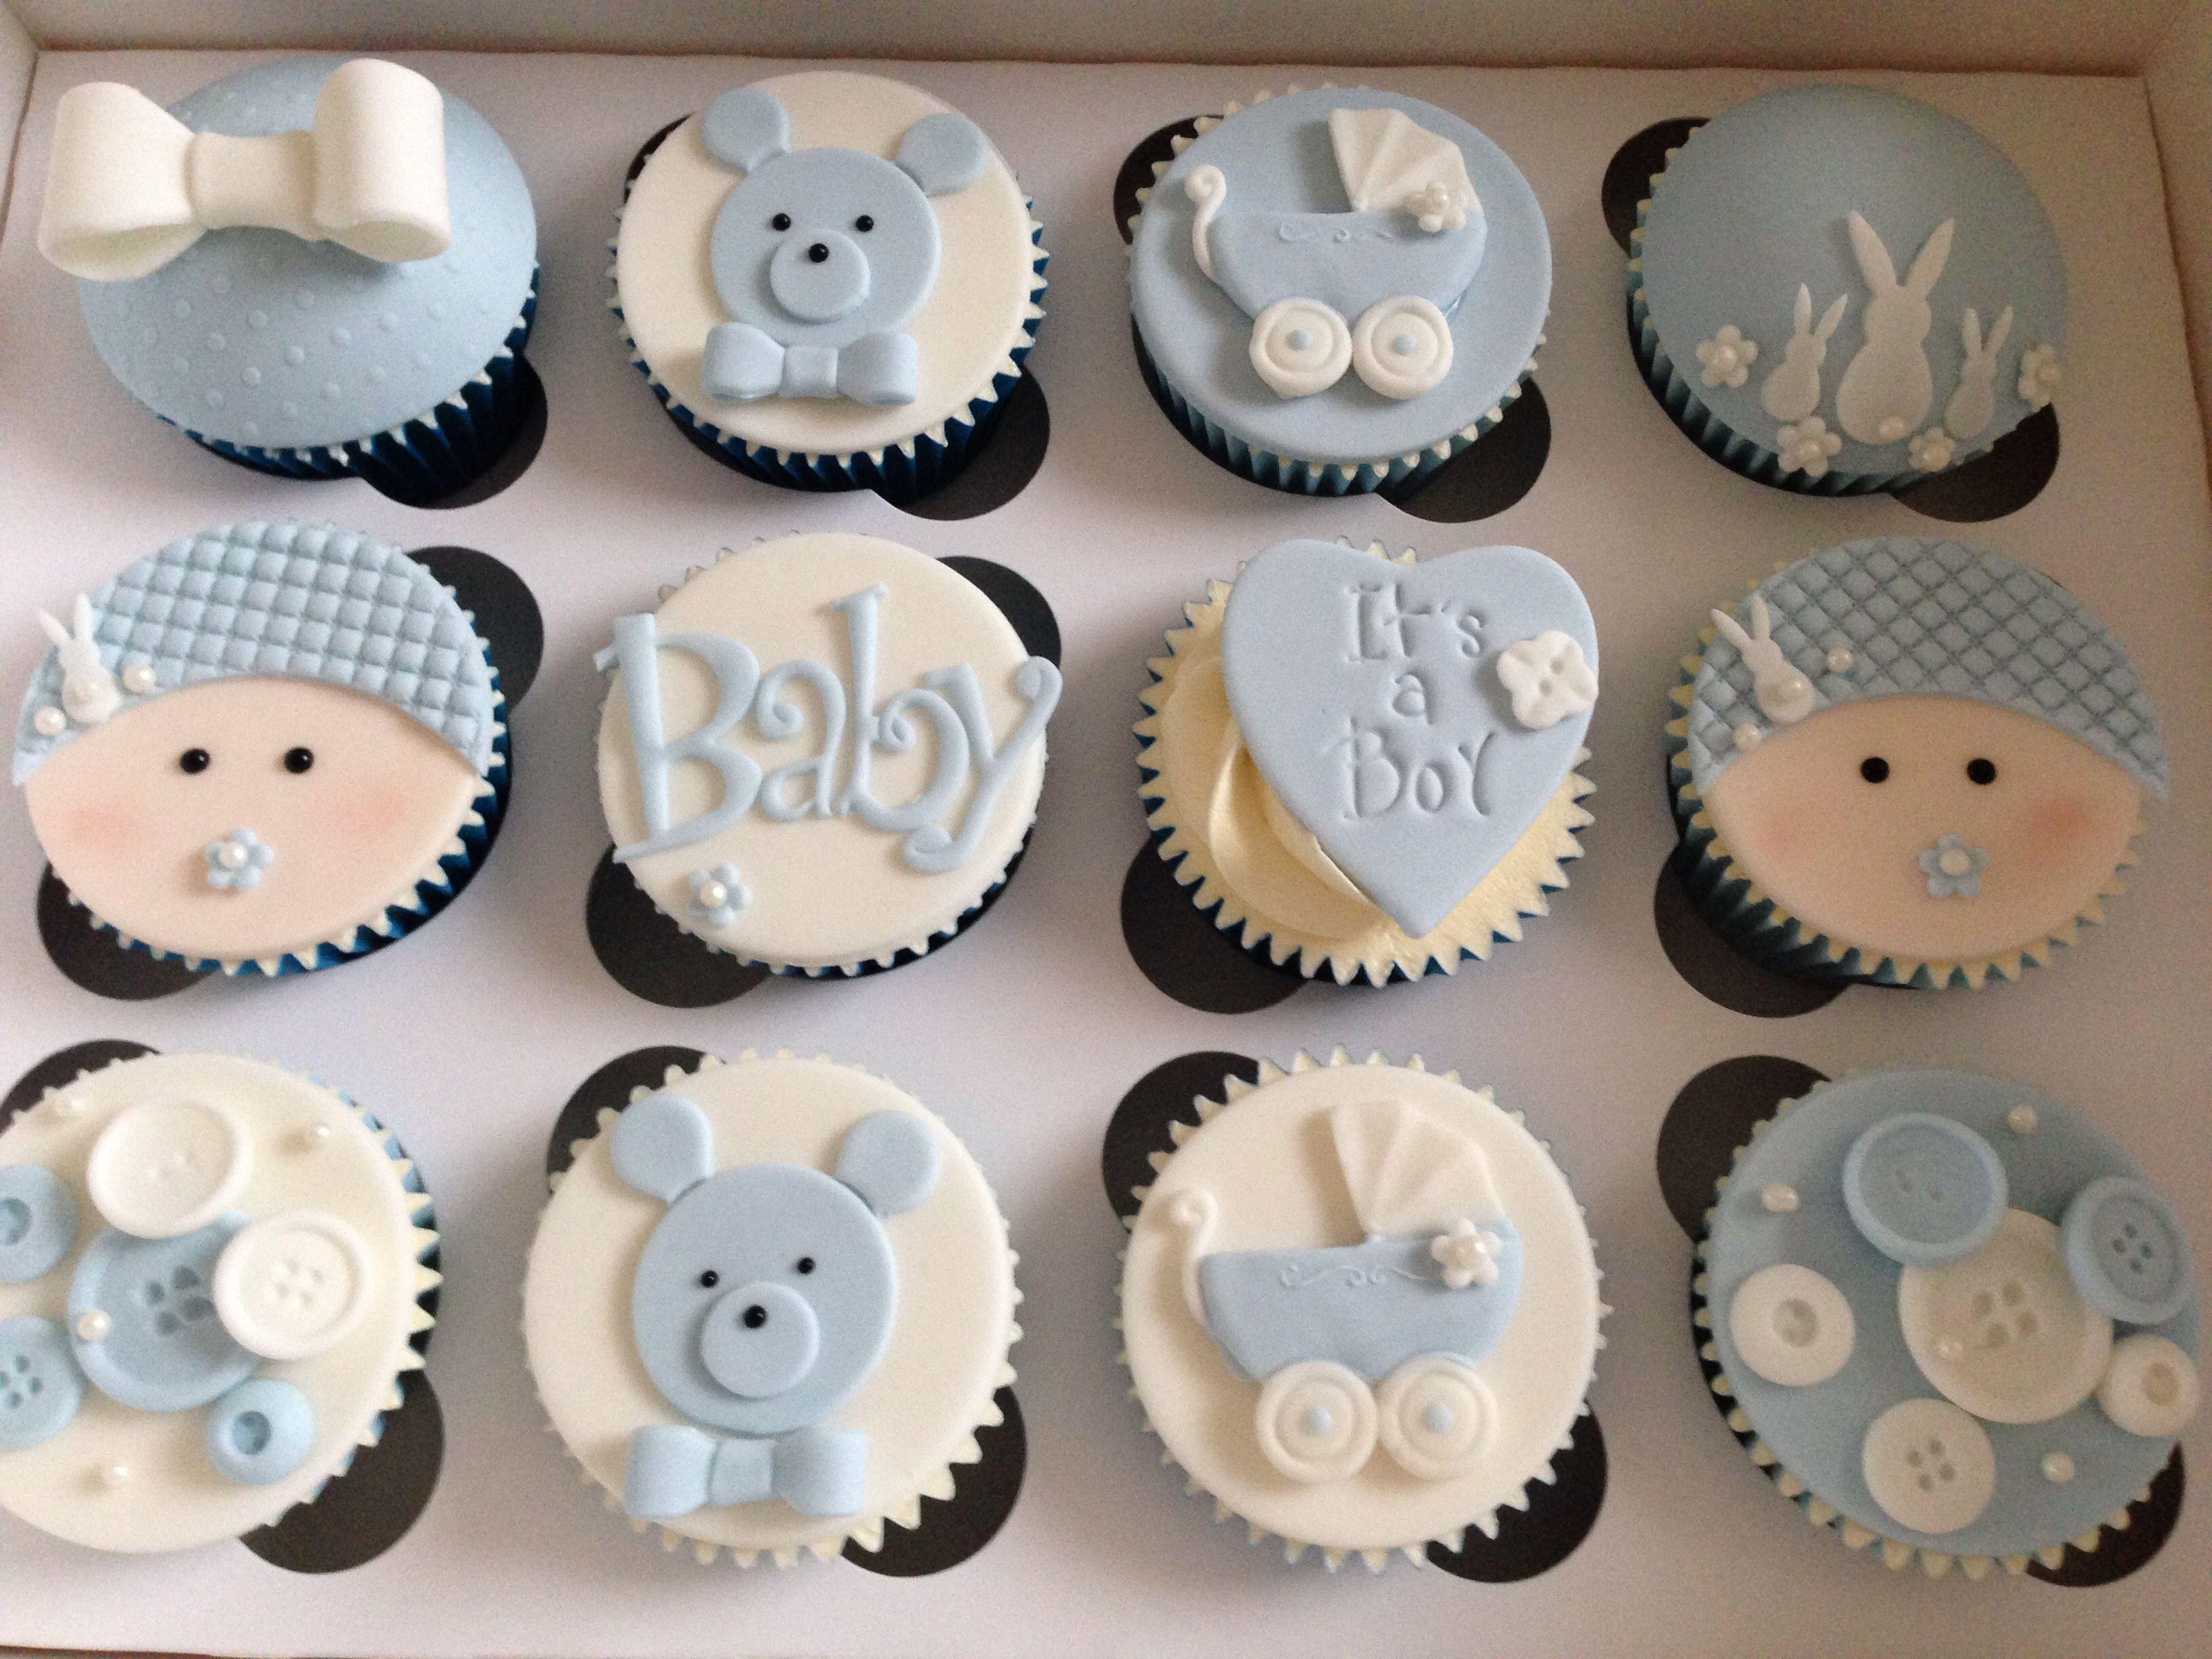 Baby Boy Cupcakes Recuerdos De Bautismo Pinterest Boys